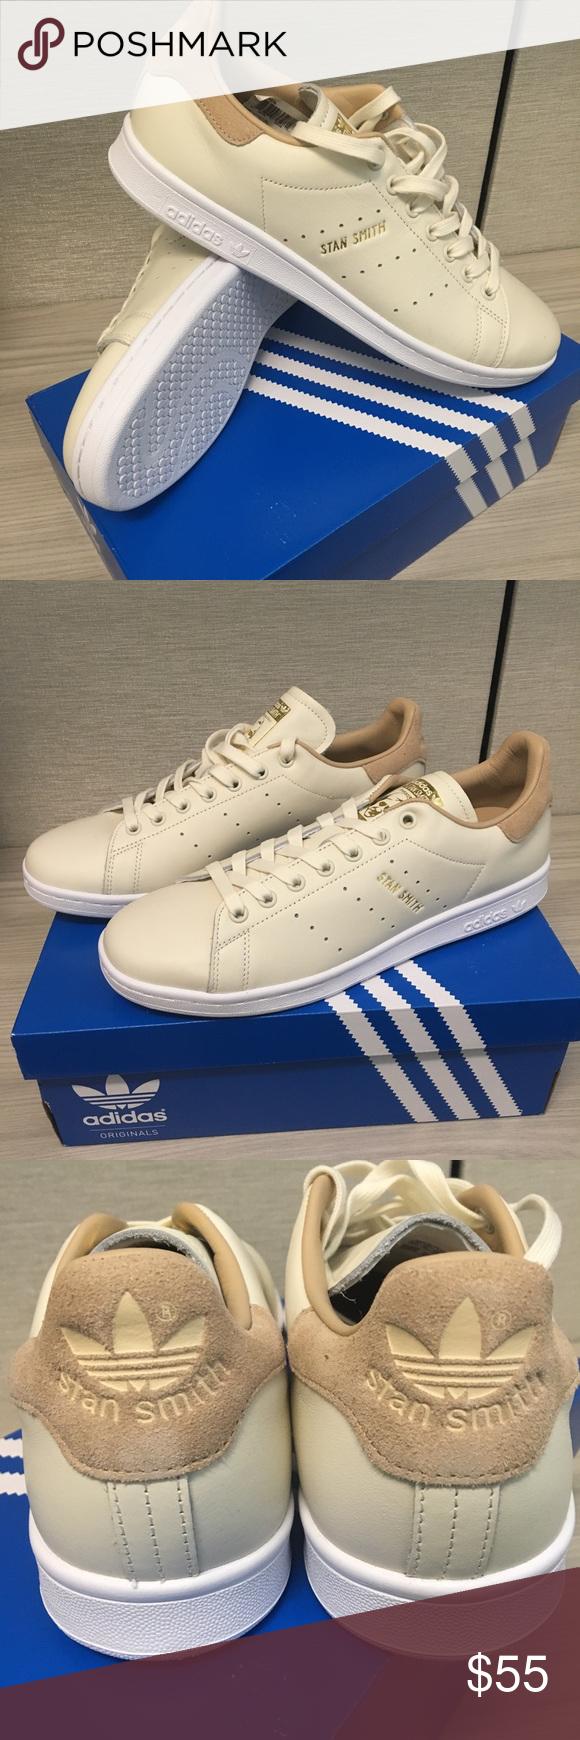 NIB Adidas / Stan Smith zapatos (CREAM / Adidas tan) sz NWT Adidas Stan 64a039